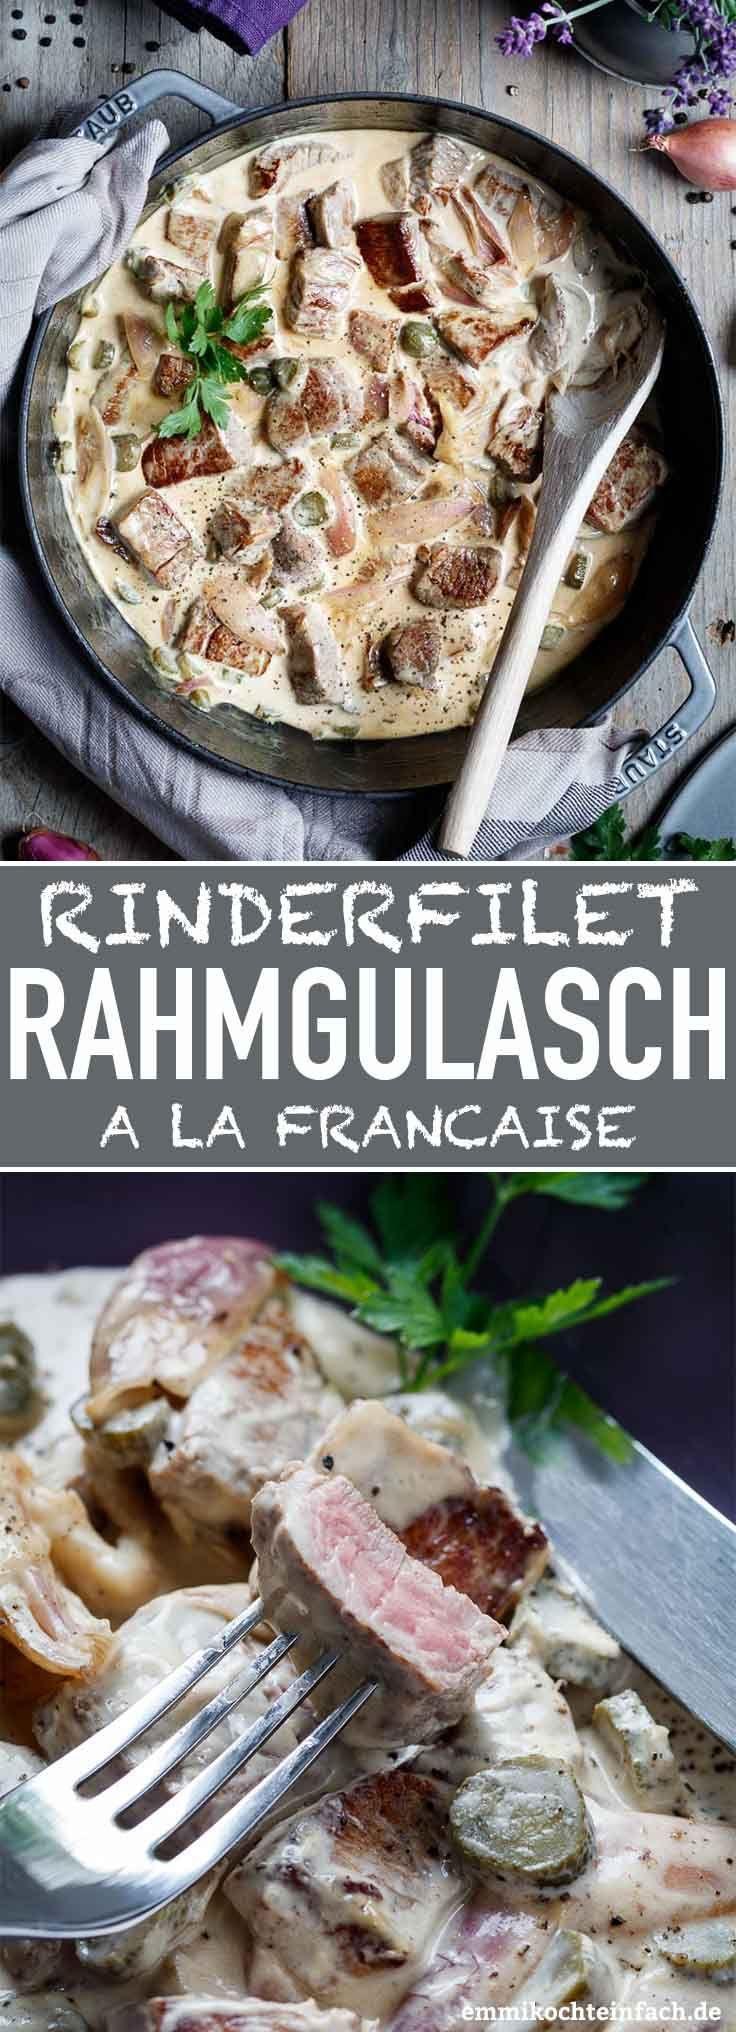 Rinderfilet Rahmgulasch à la Française #beefsteakrecipe